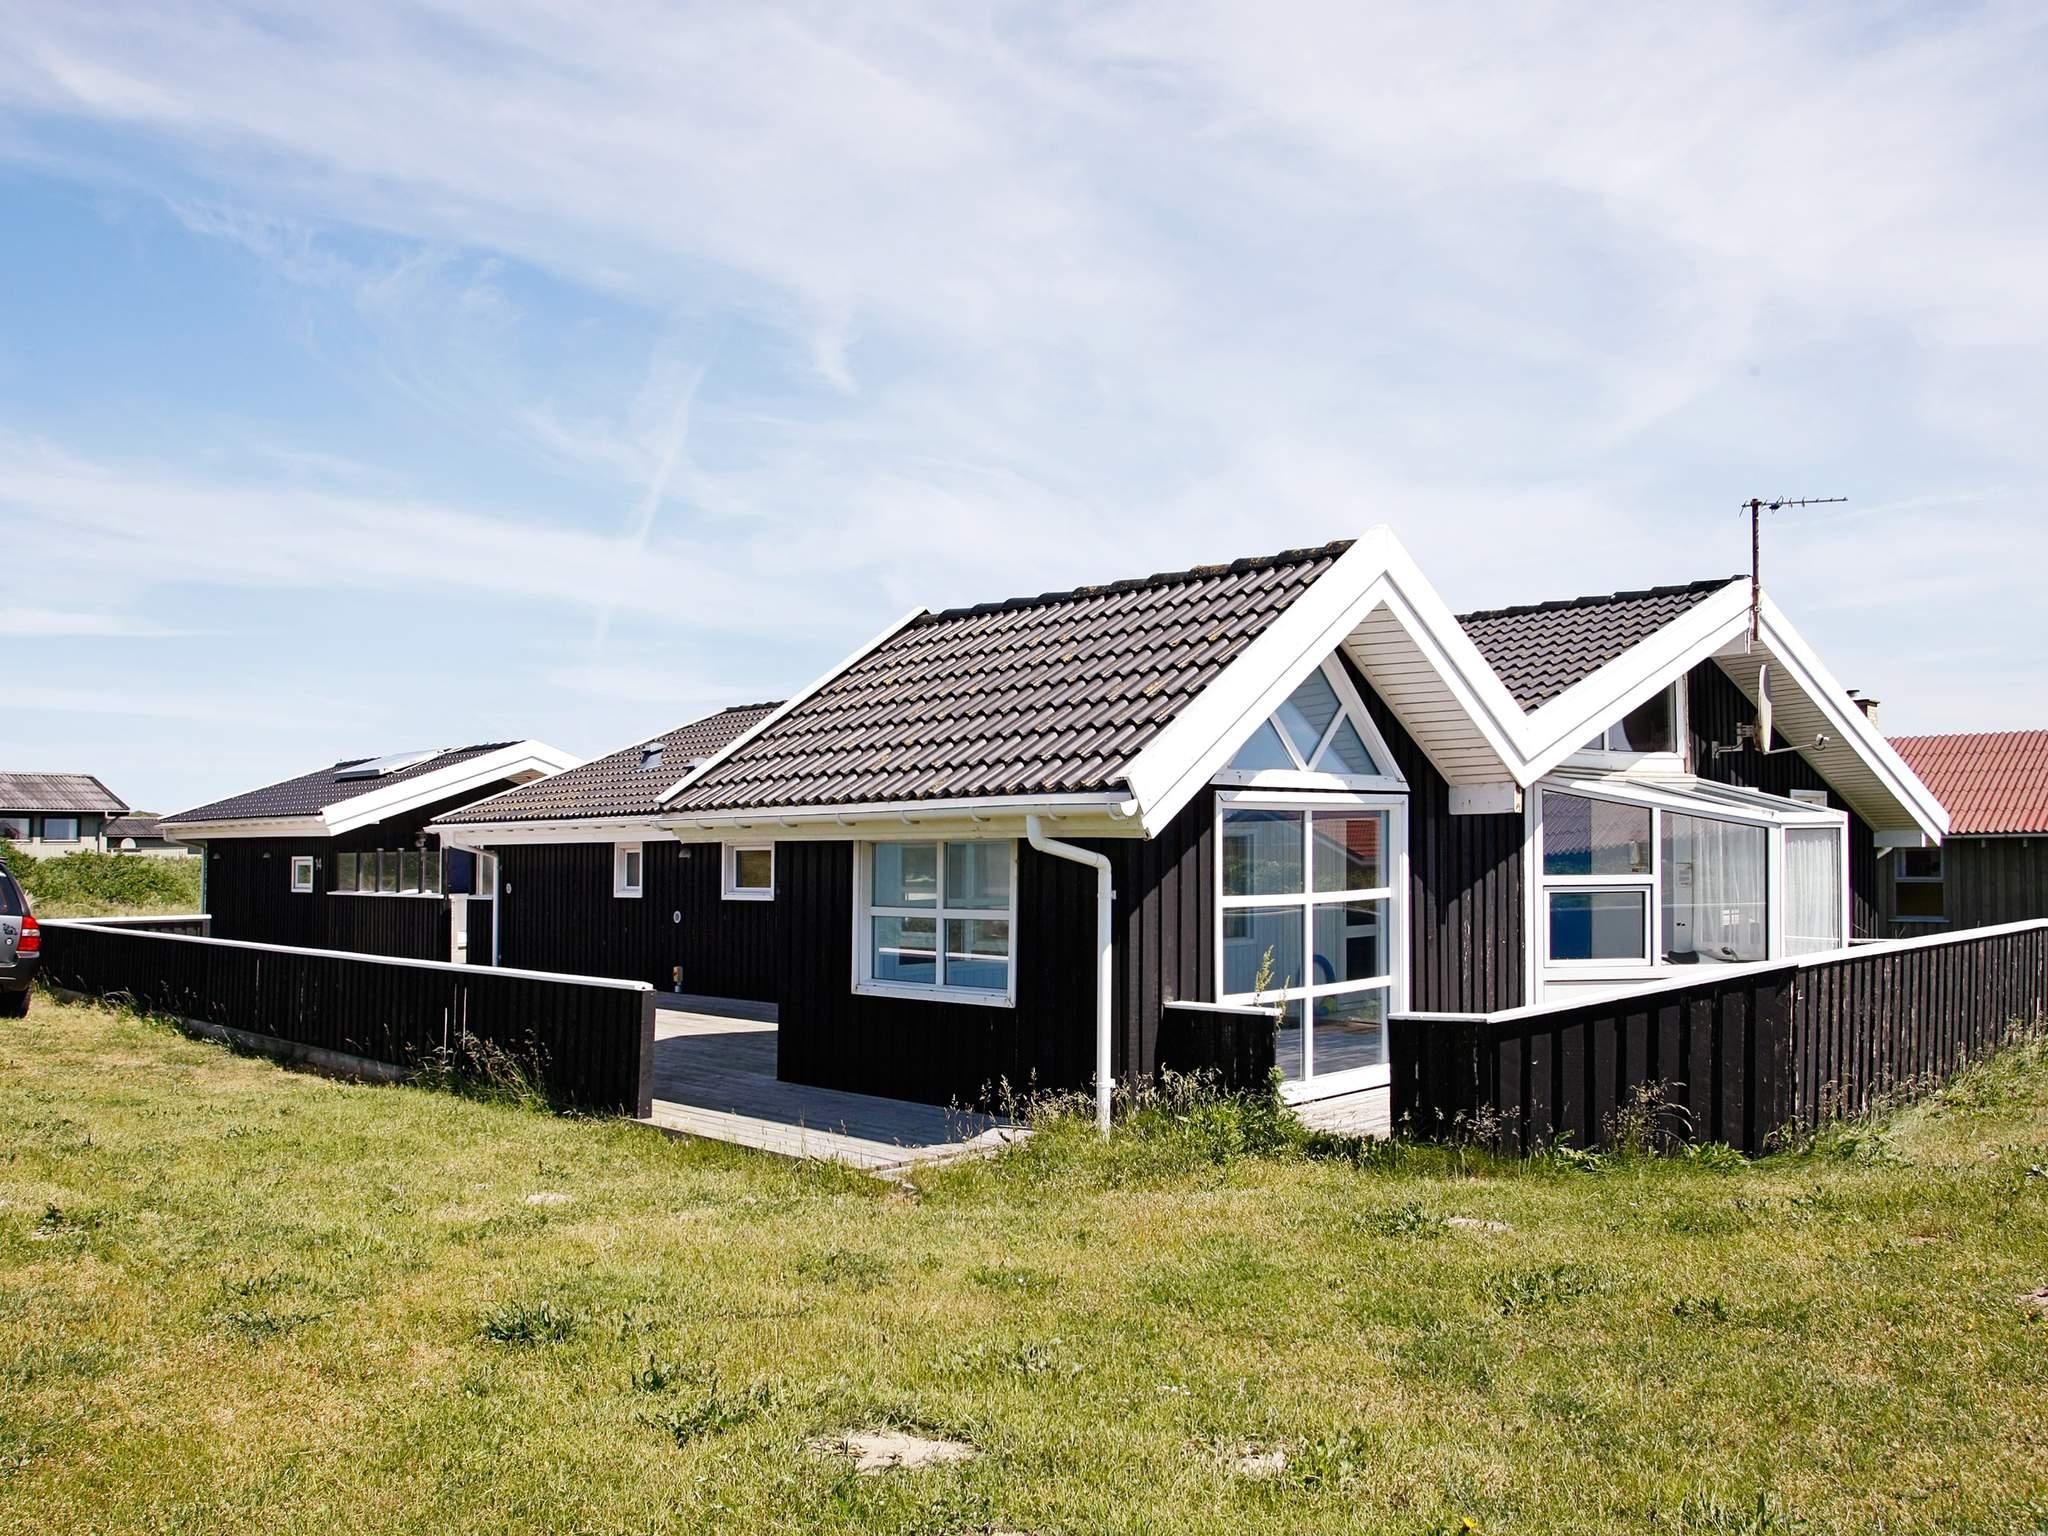 Ferienhaus Nr. Lyngby (89445), Løkken, , Nordwestjütland, Dänemark, Bild 1